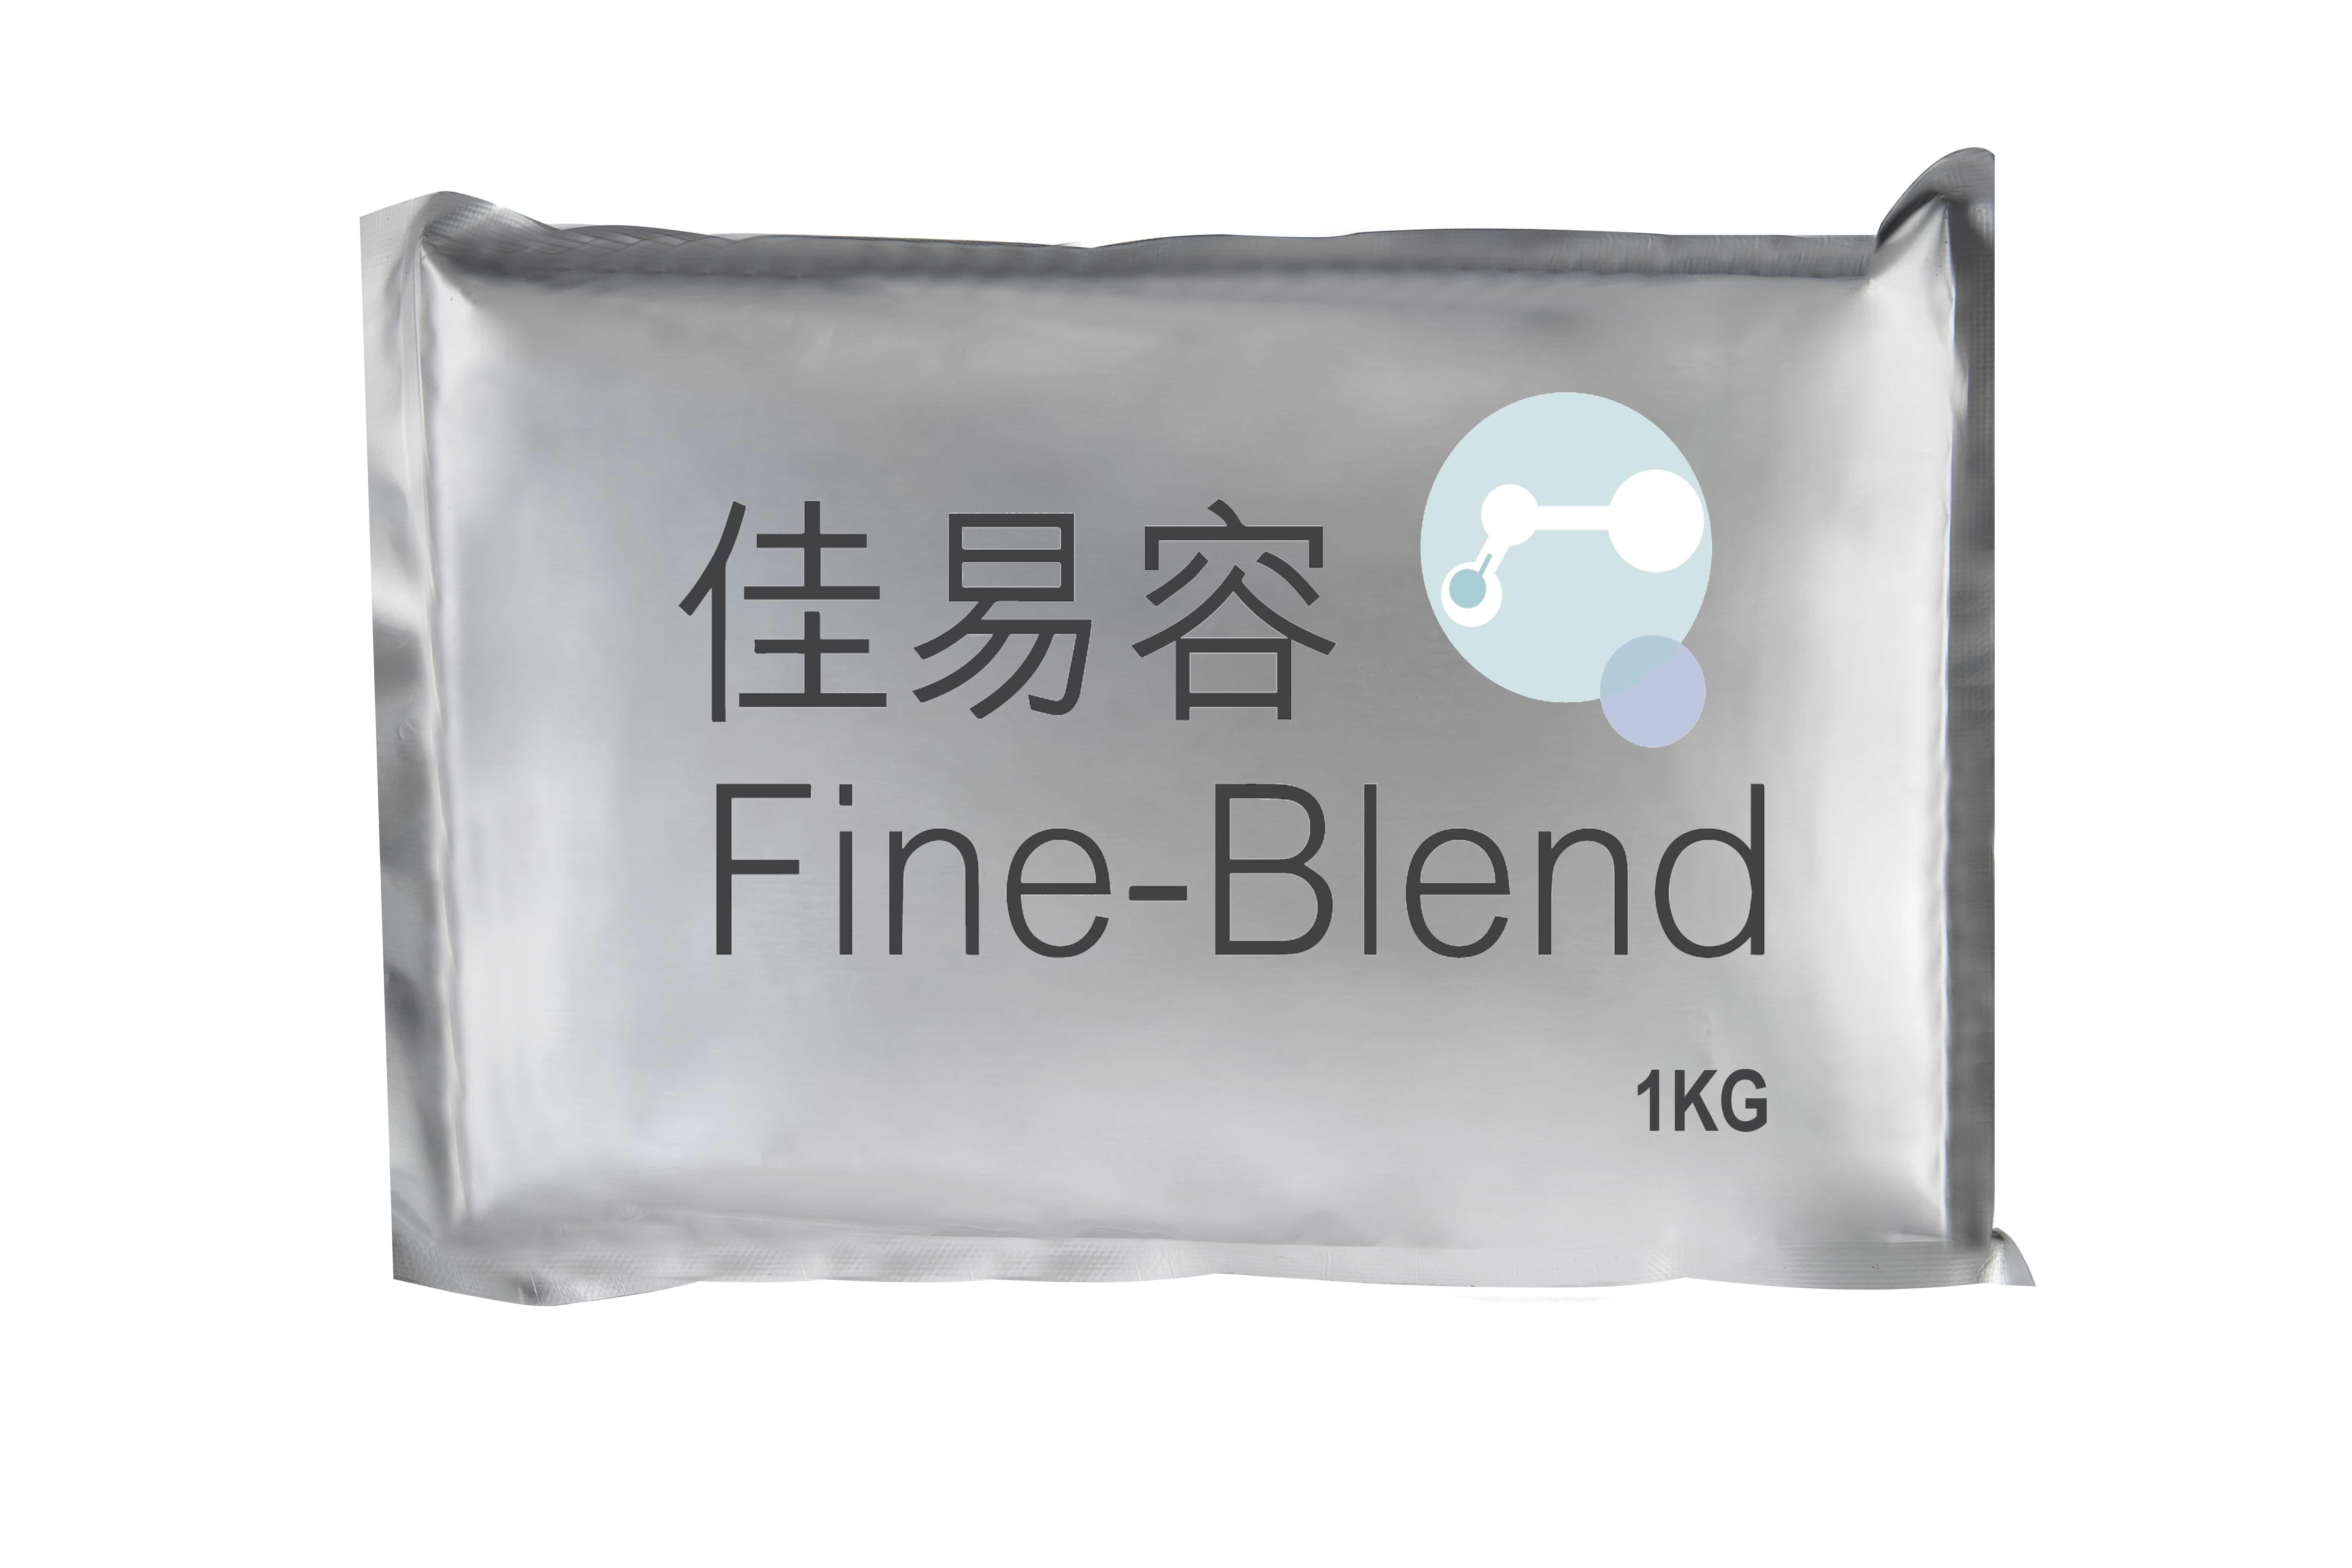 Fine Blend EMI 100   1 kg (2.2 lb)